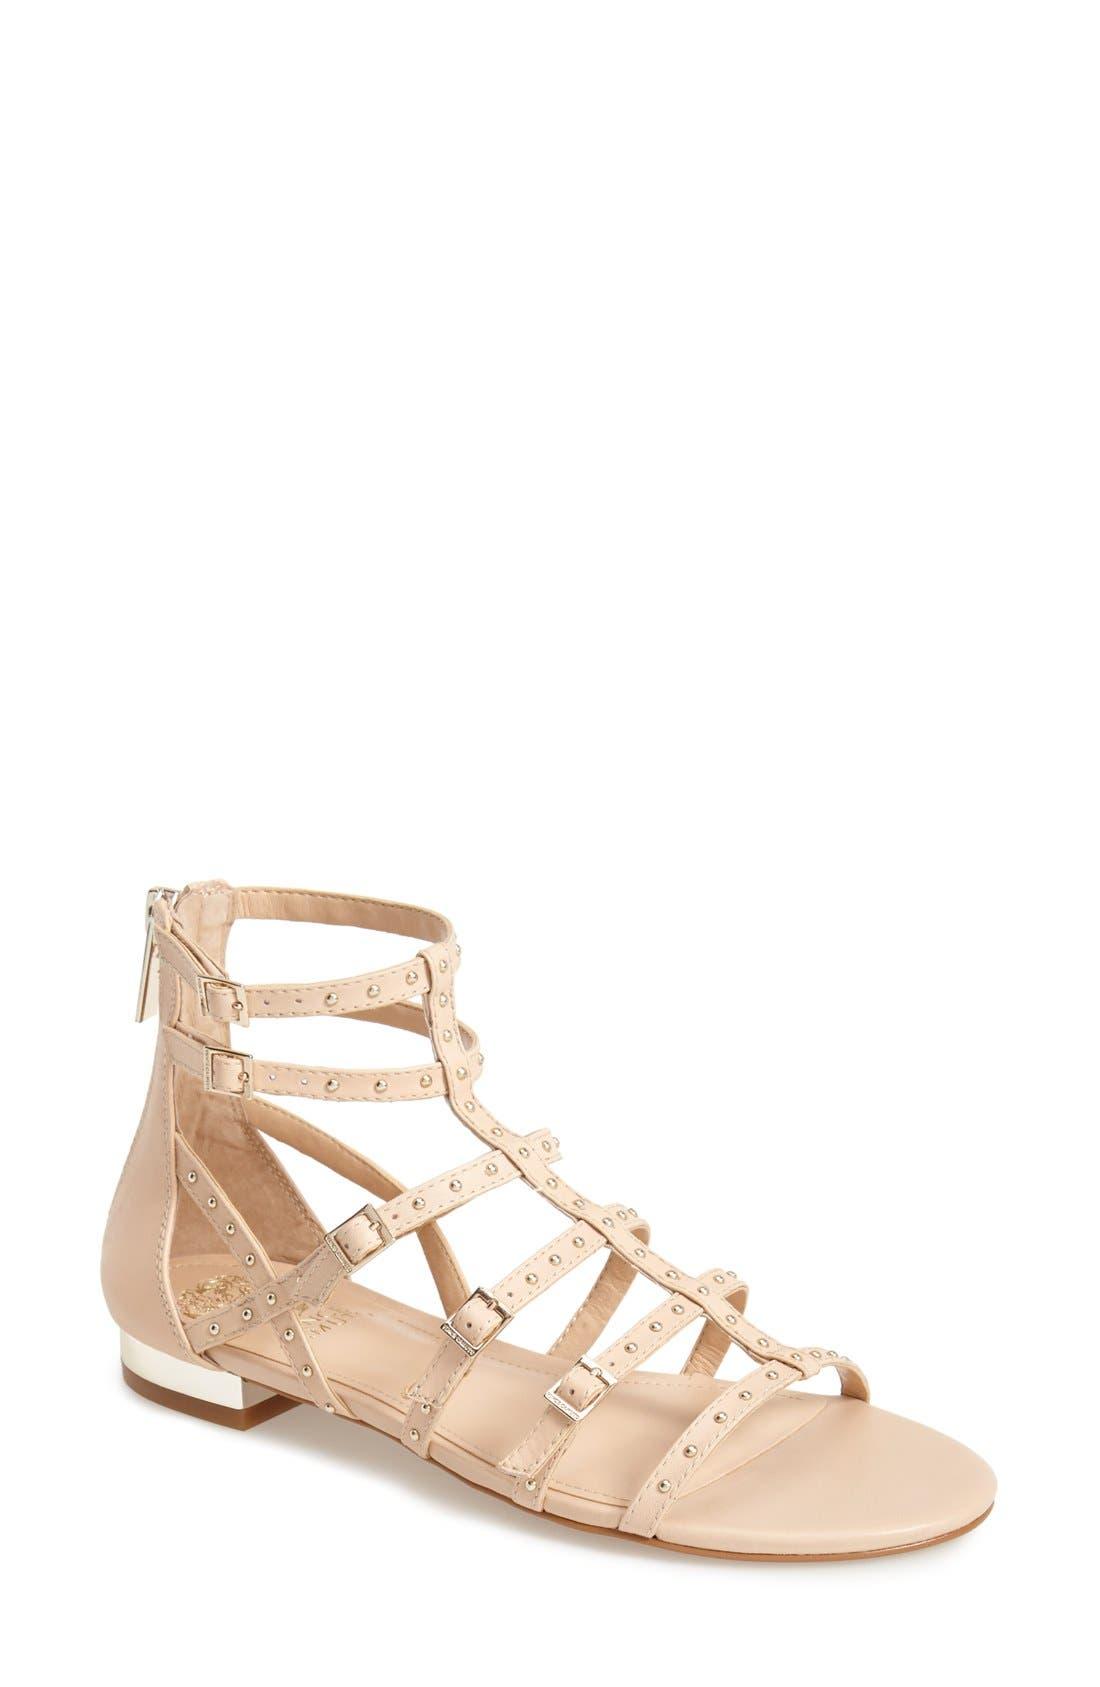 Alternate Image 1 Selected - Vince Camuto 'Hevelli' Studded Leather Gladiator Sandal (Women)